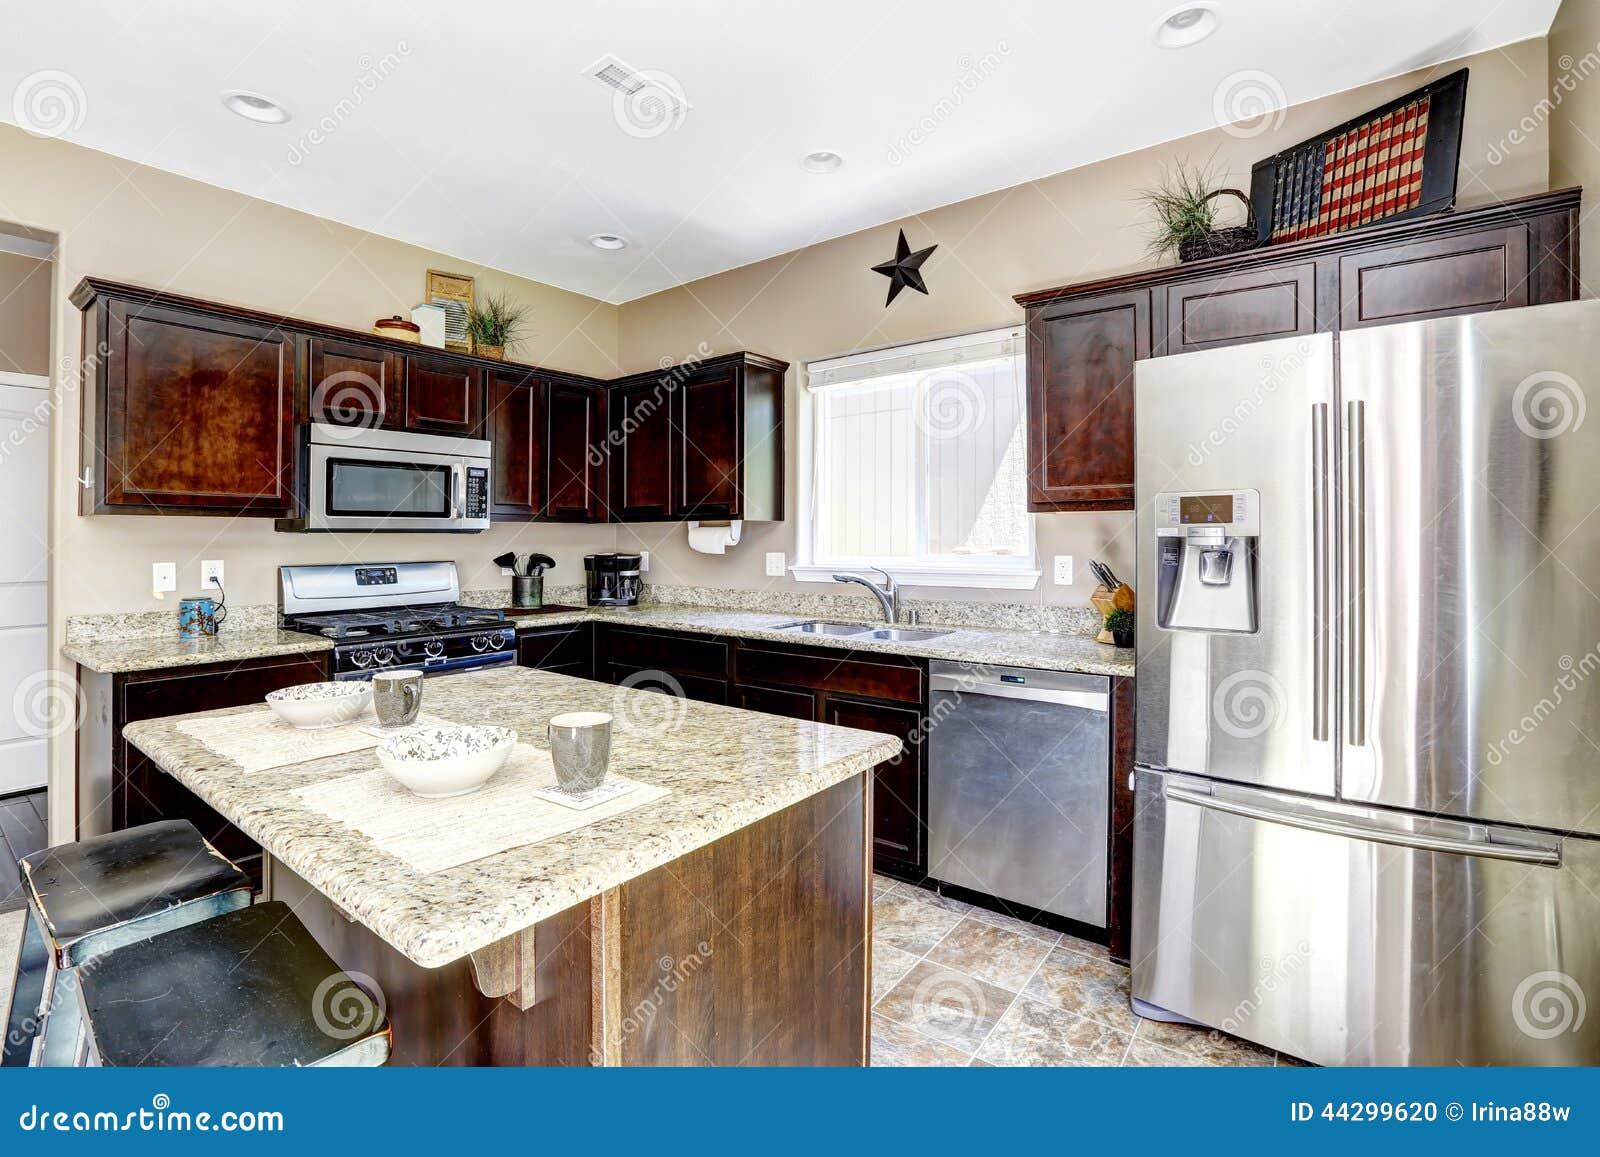 new home kitchen interior with dark brown cabinets stock photo